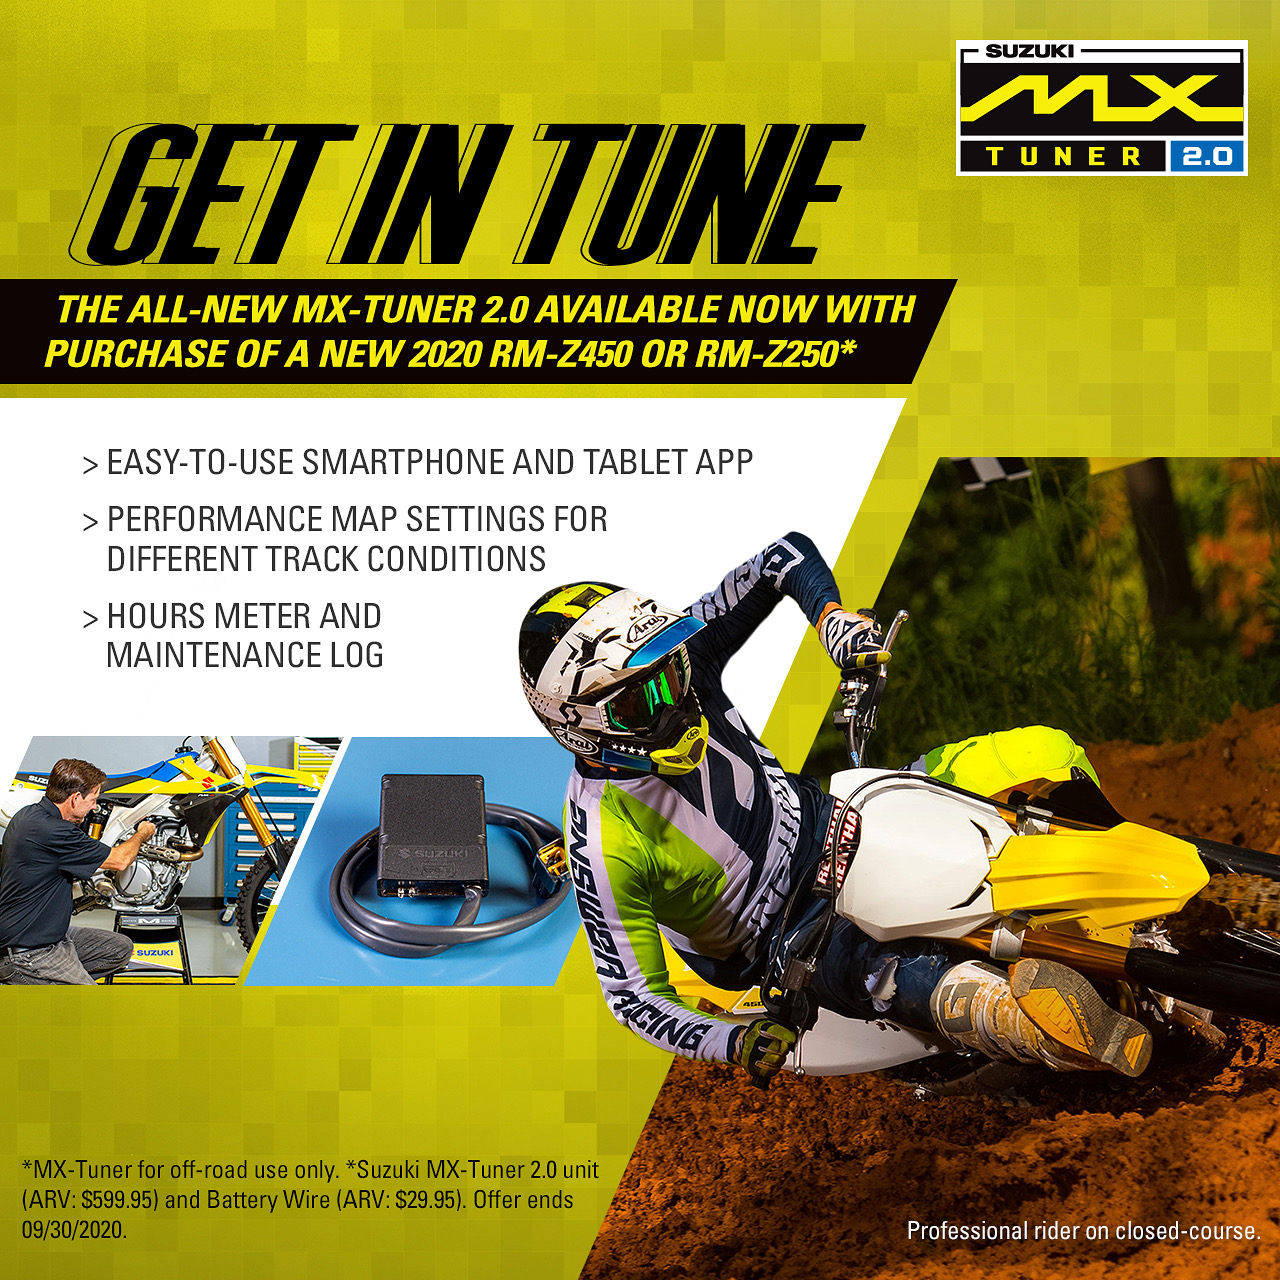 200804 Suzuki Introduces All New MX-Tuner 2.0 Performance Tuning System (2)